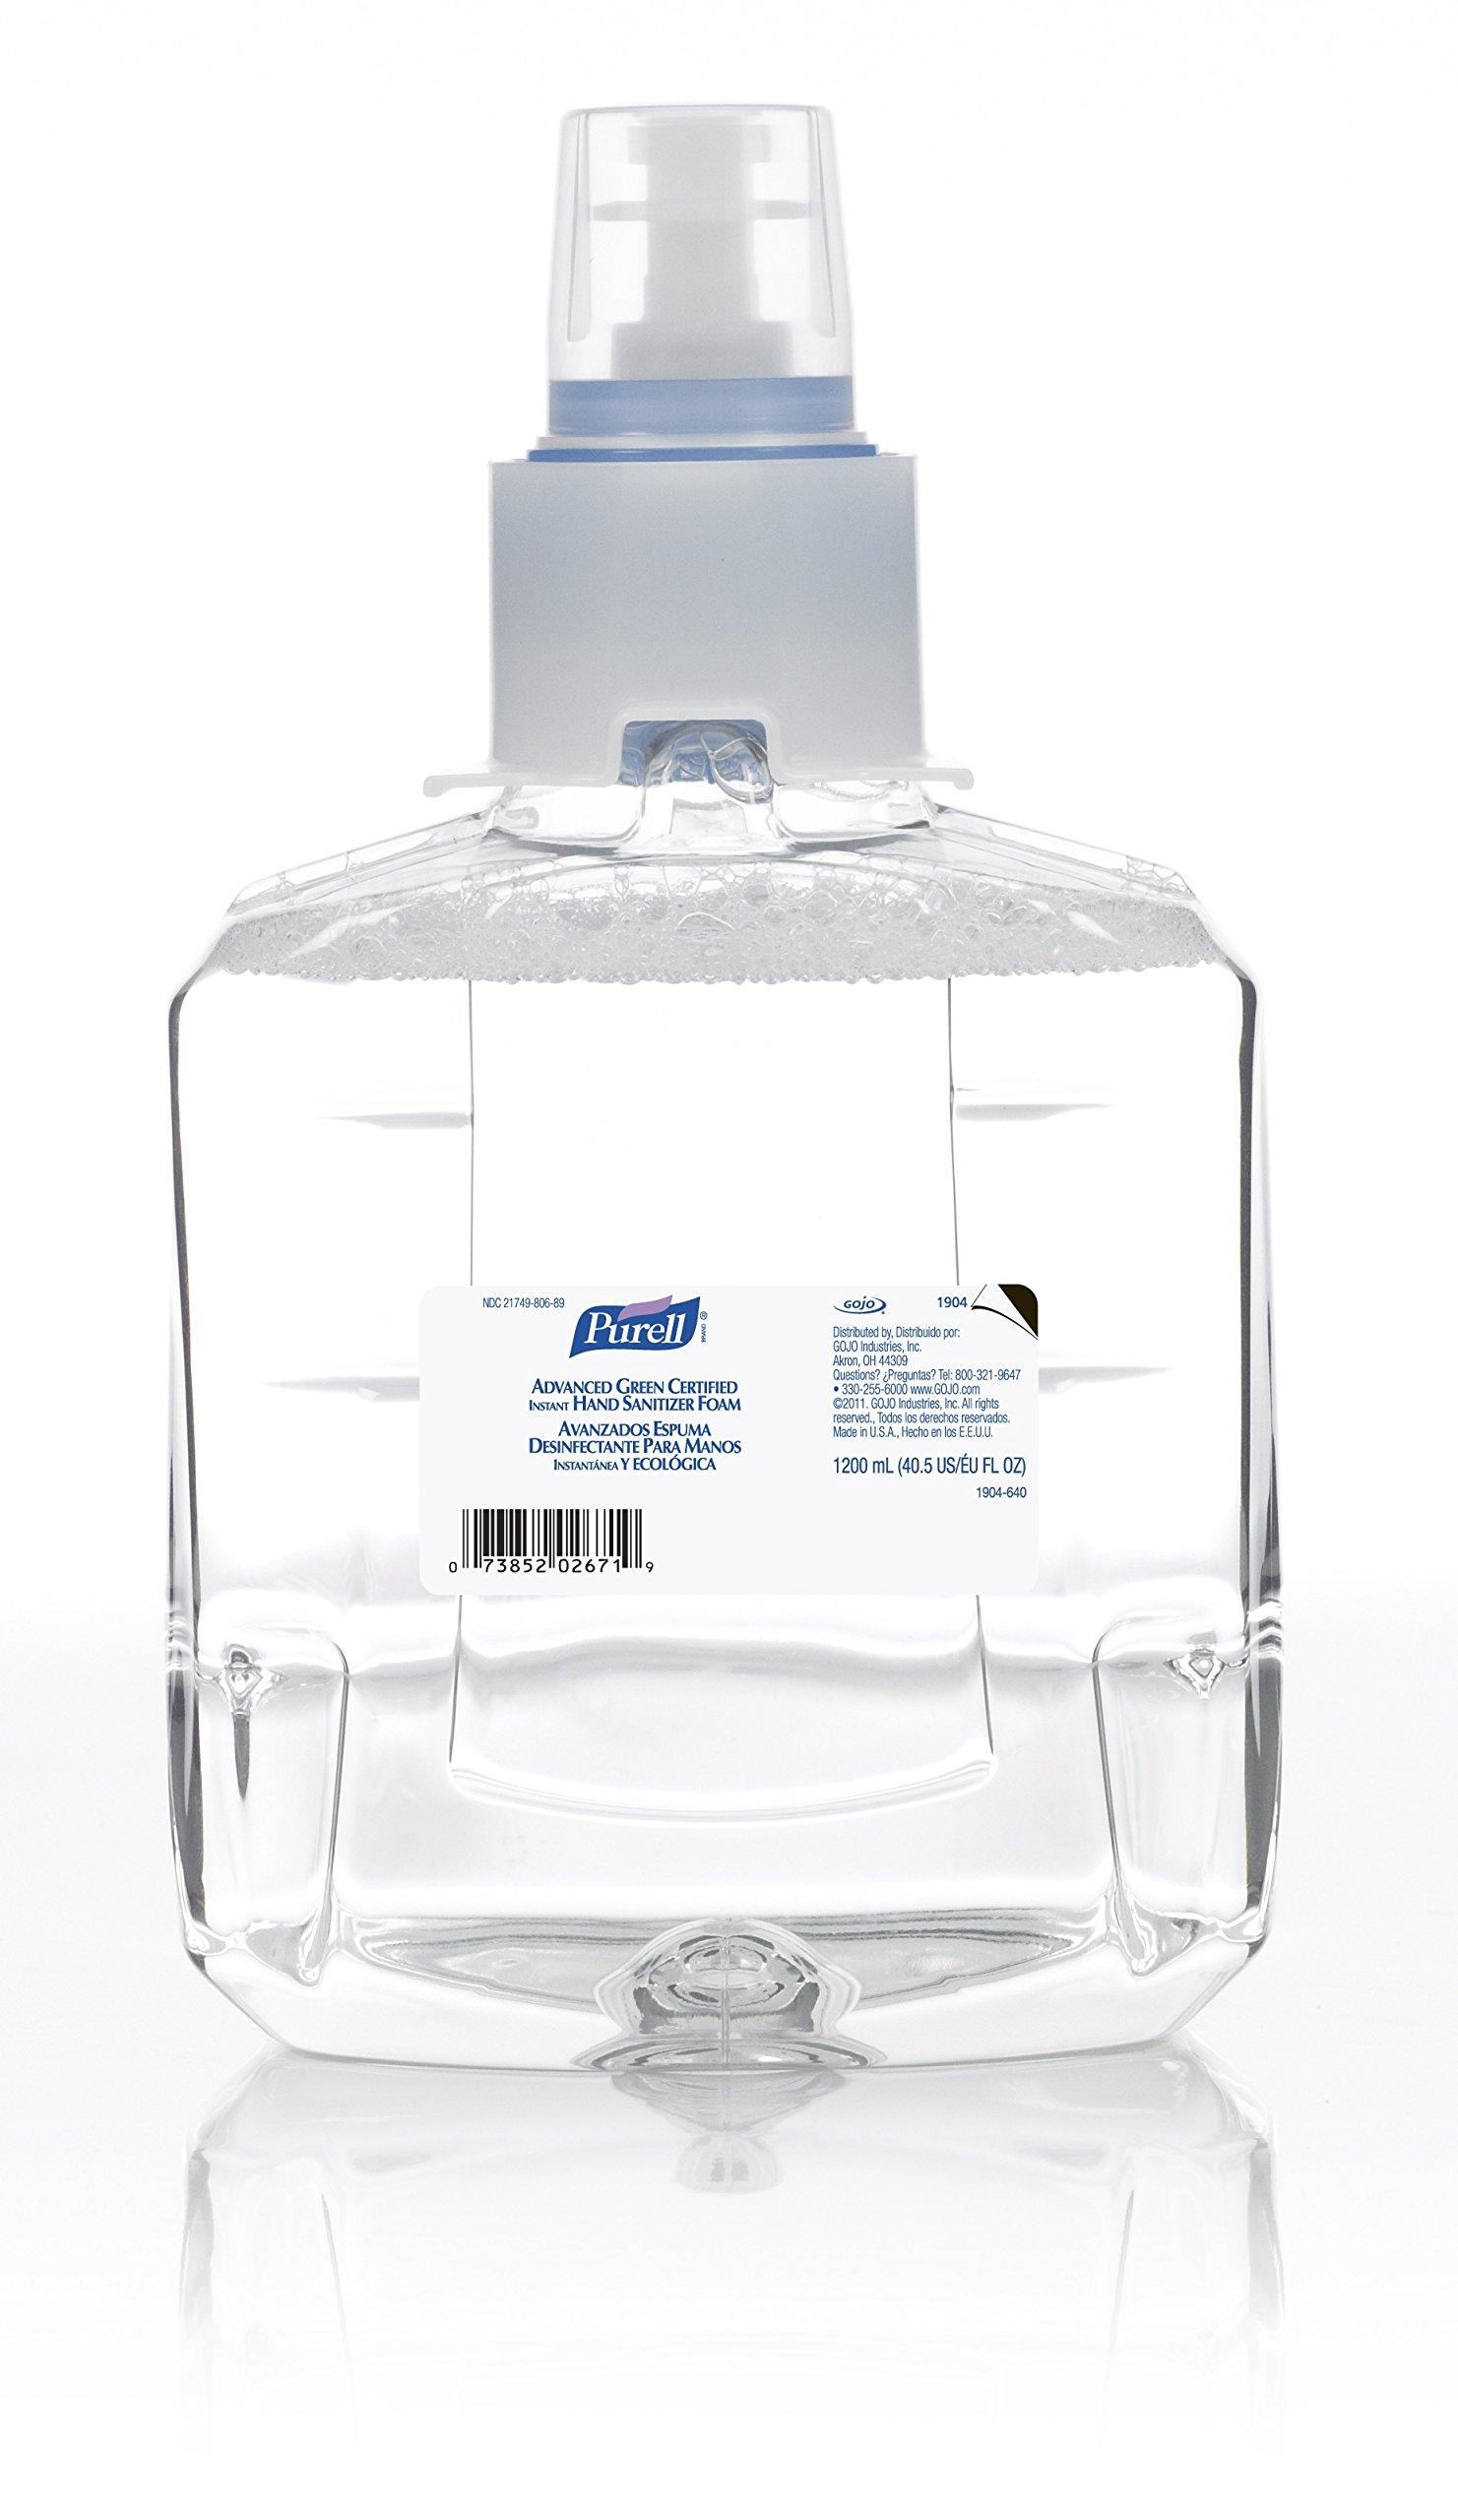 PURELL LTX-12 Advanced Green Certified Instant Hand Sanitizer Foam, Fragrance Free, 1200 mL Sanitizer Refill for PURELL LTX-12 Touch-Free Dispenser - 1903-06-EC